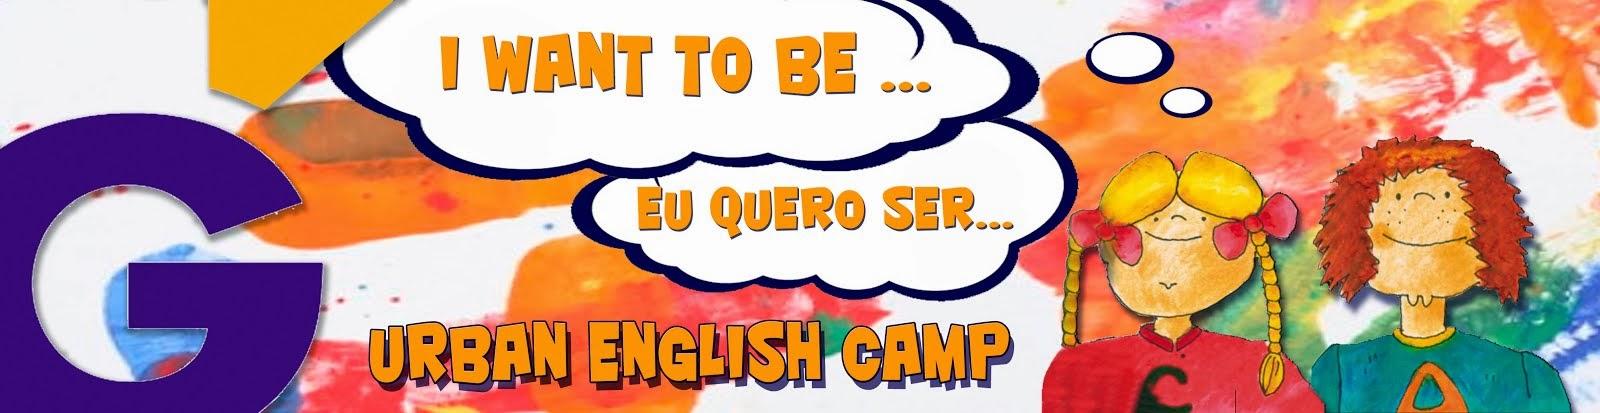 Urban English Camp